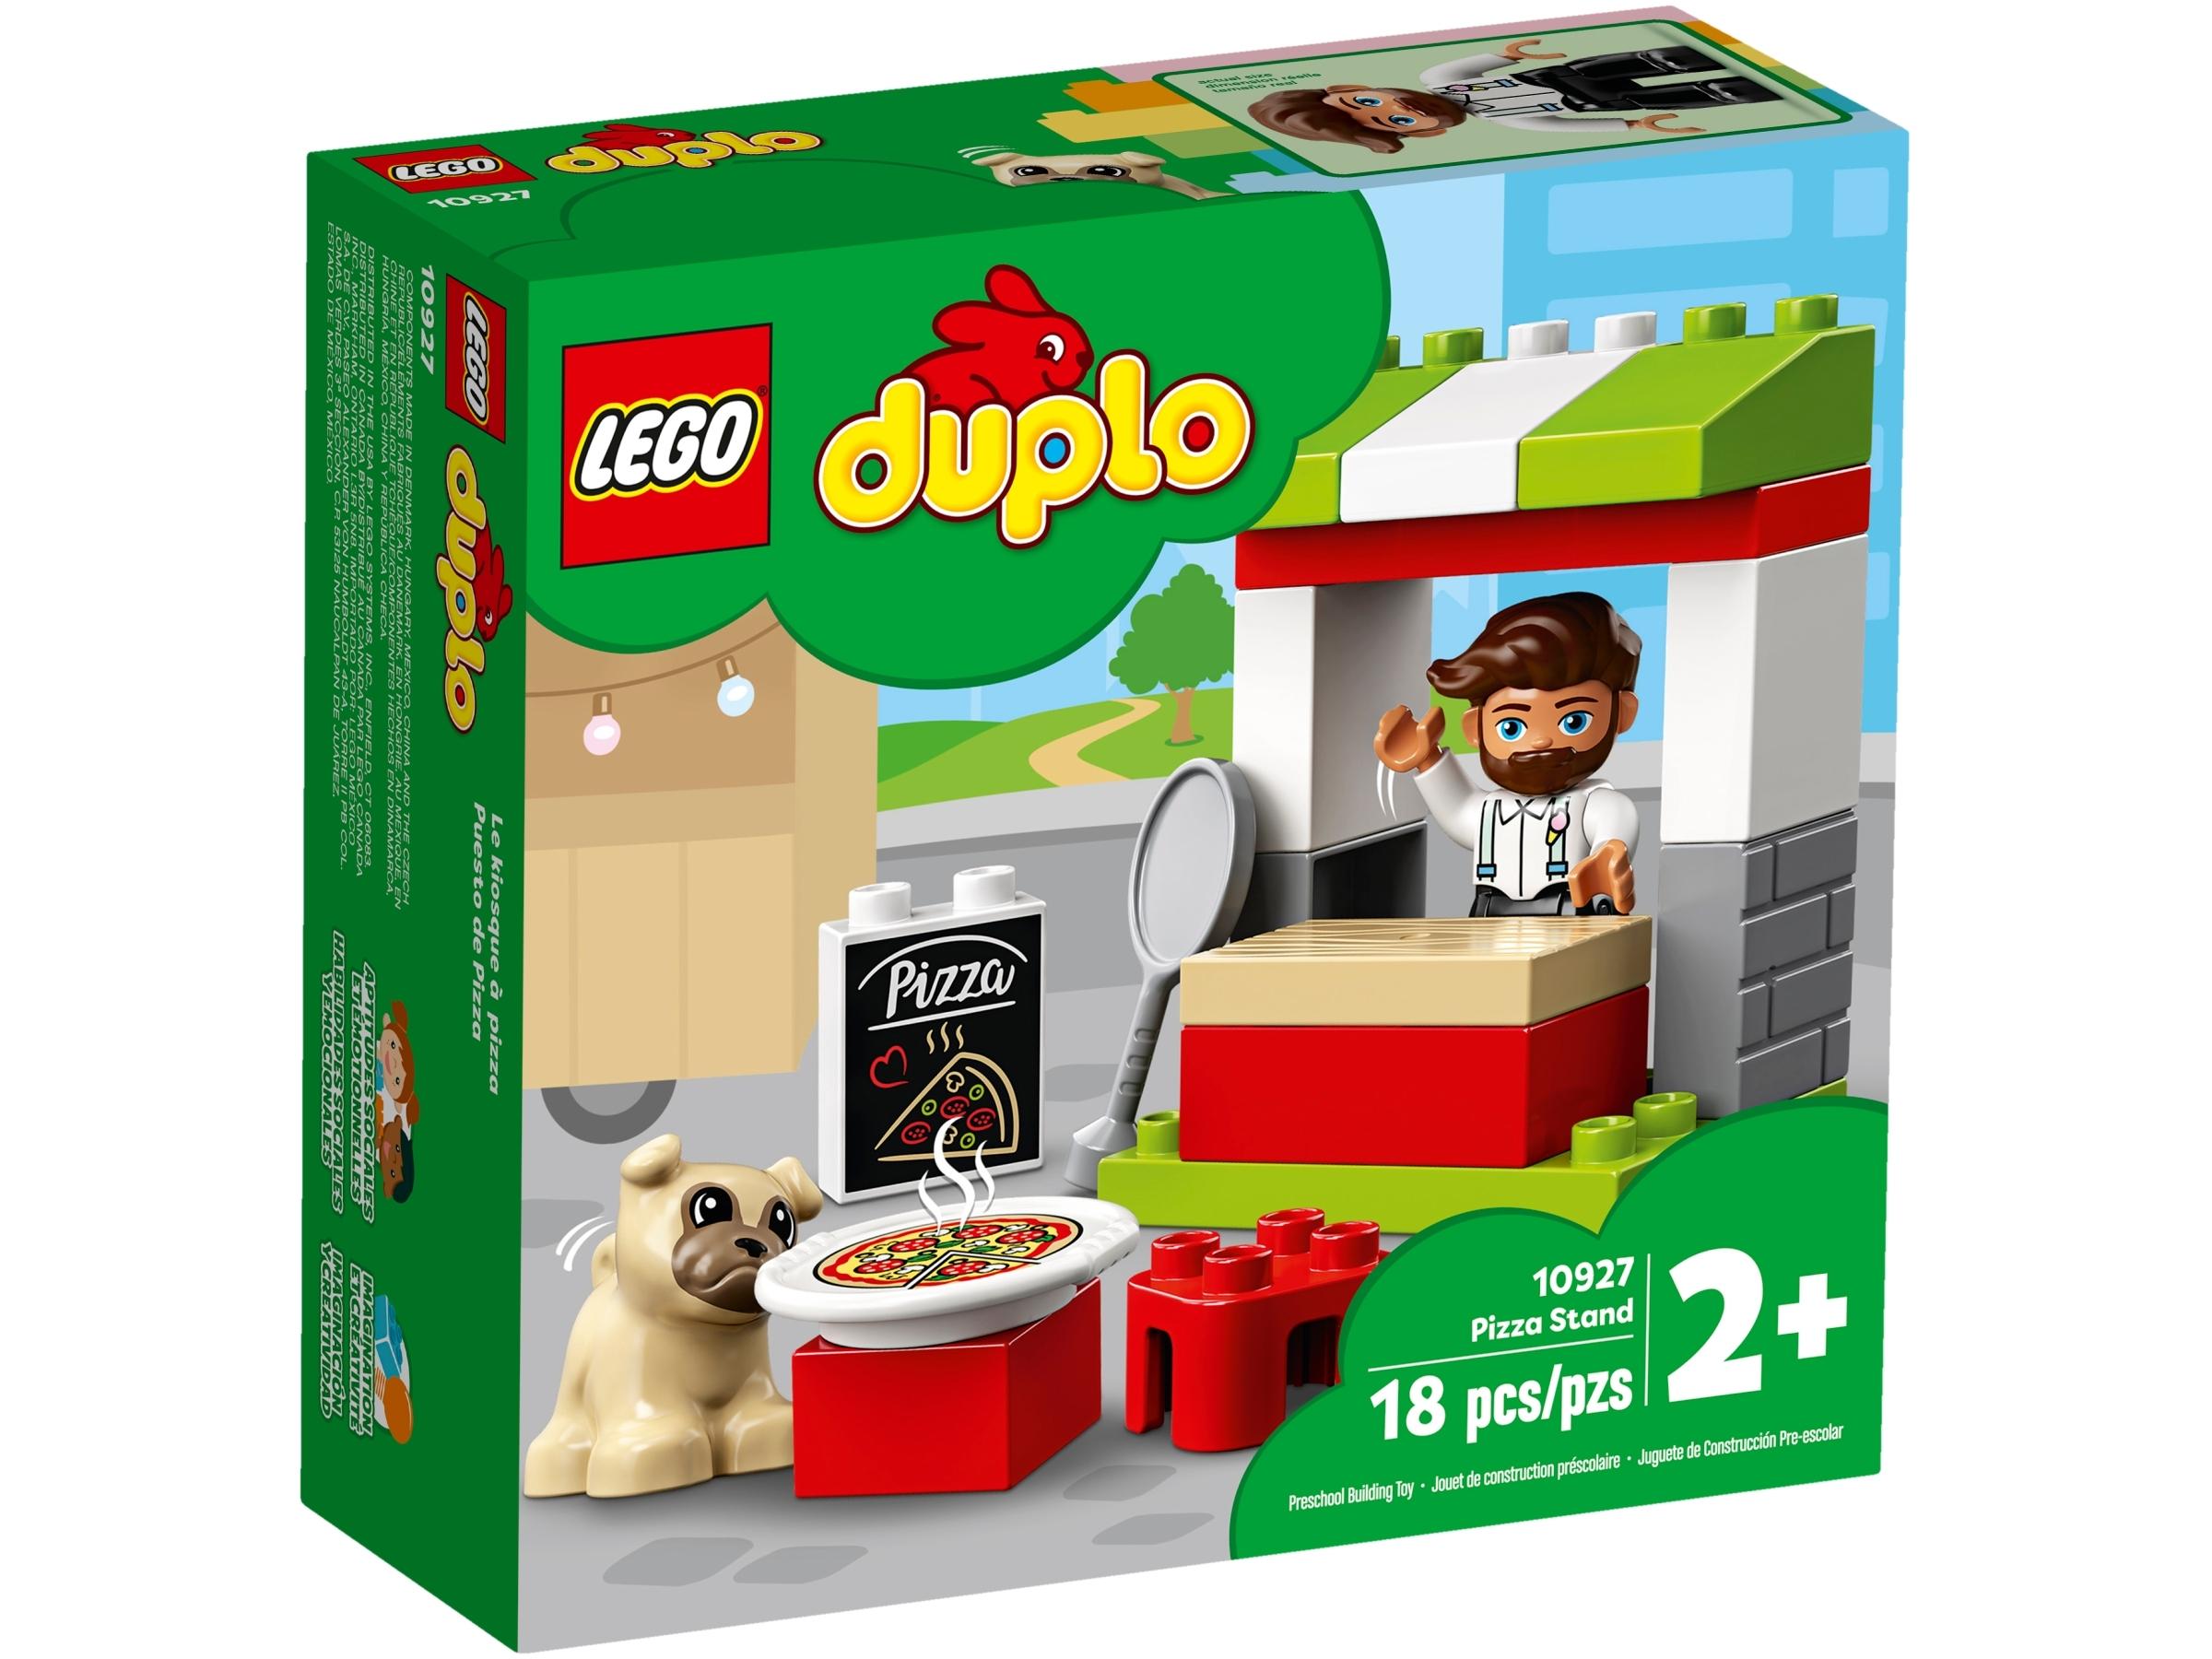 LEGO DUPLO 10927 Pizzastånd